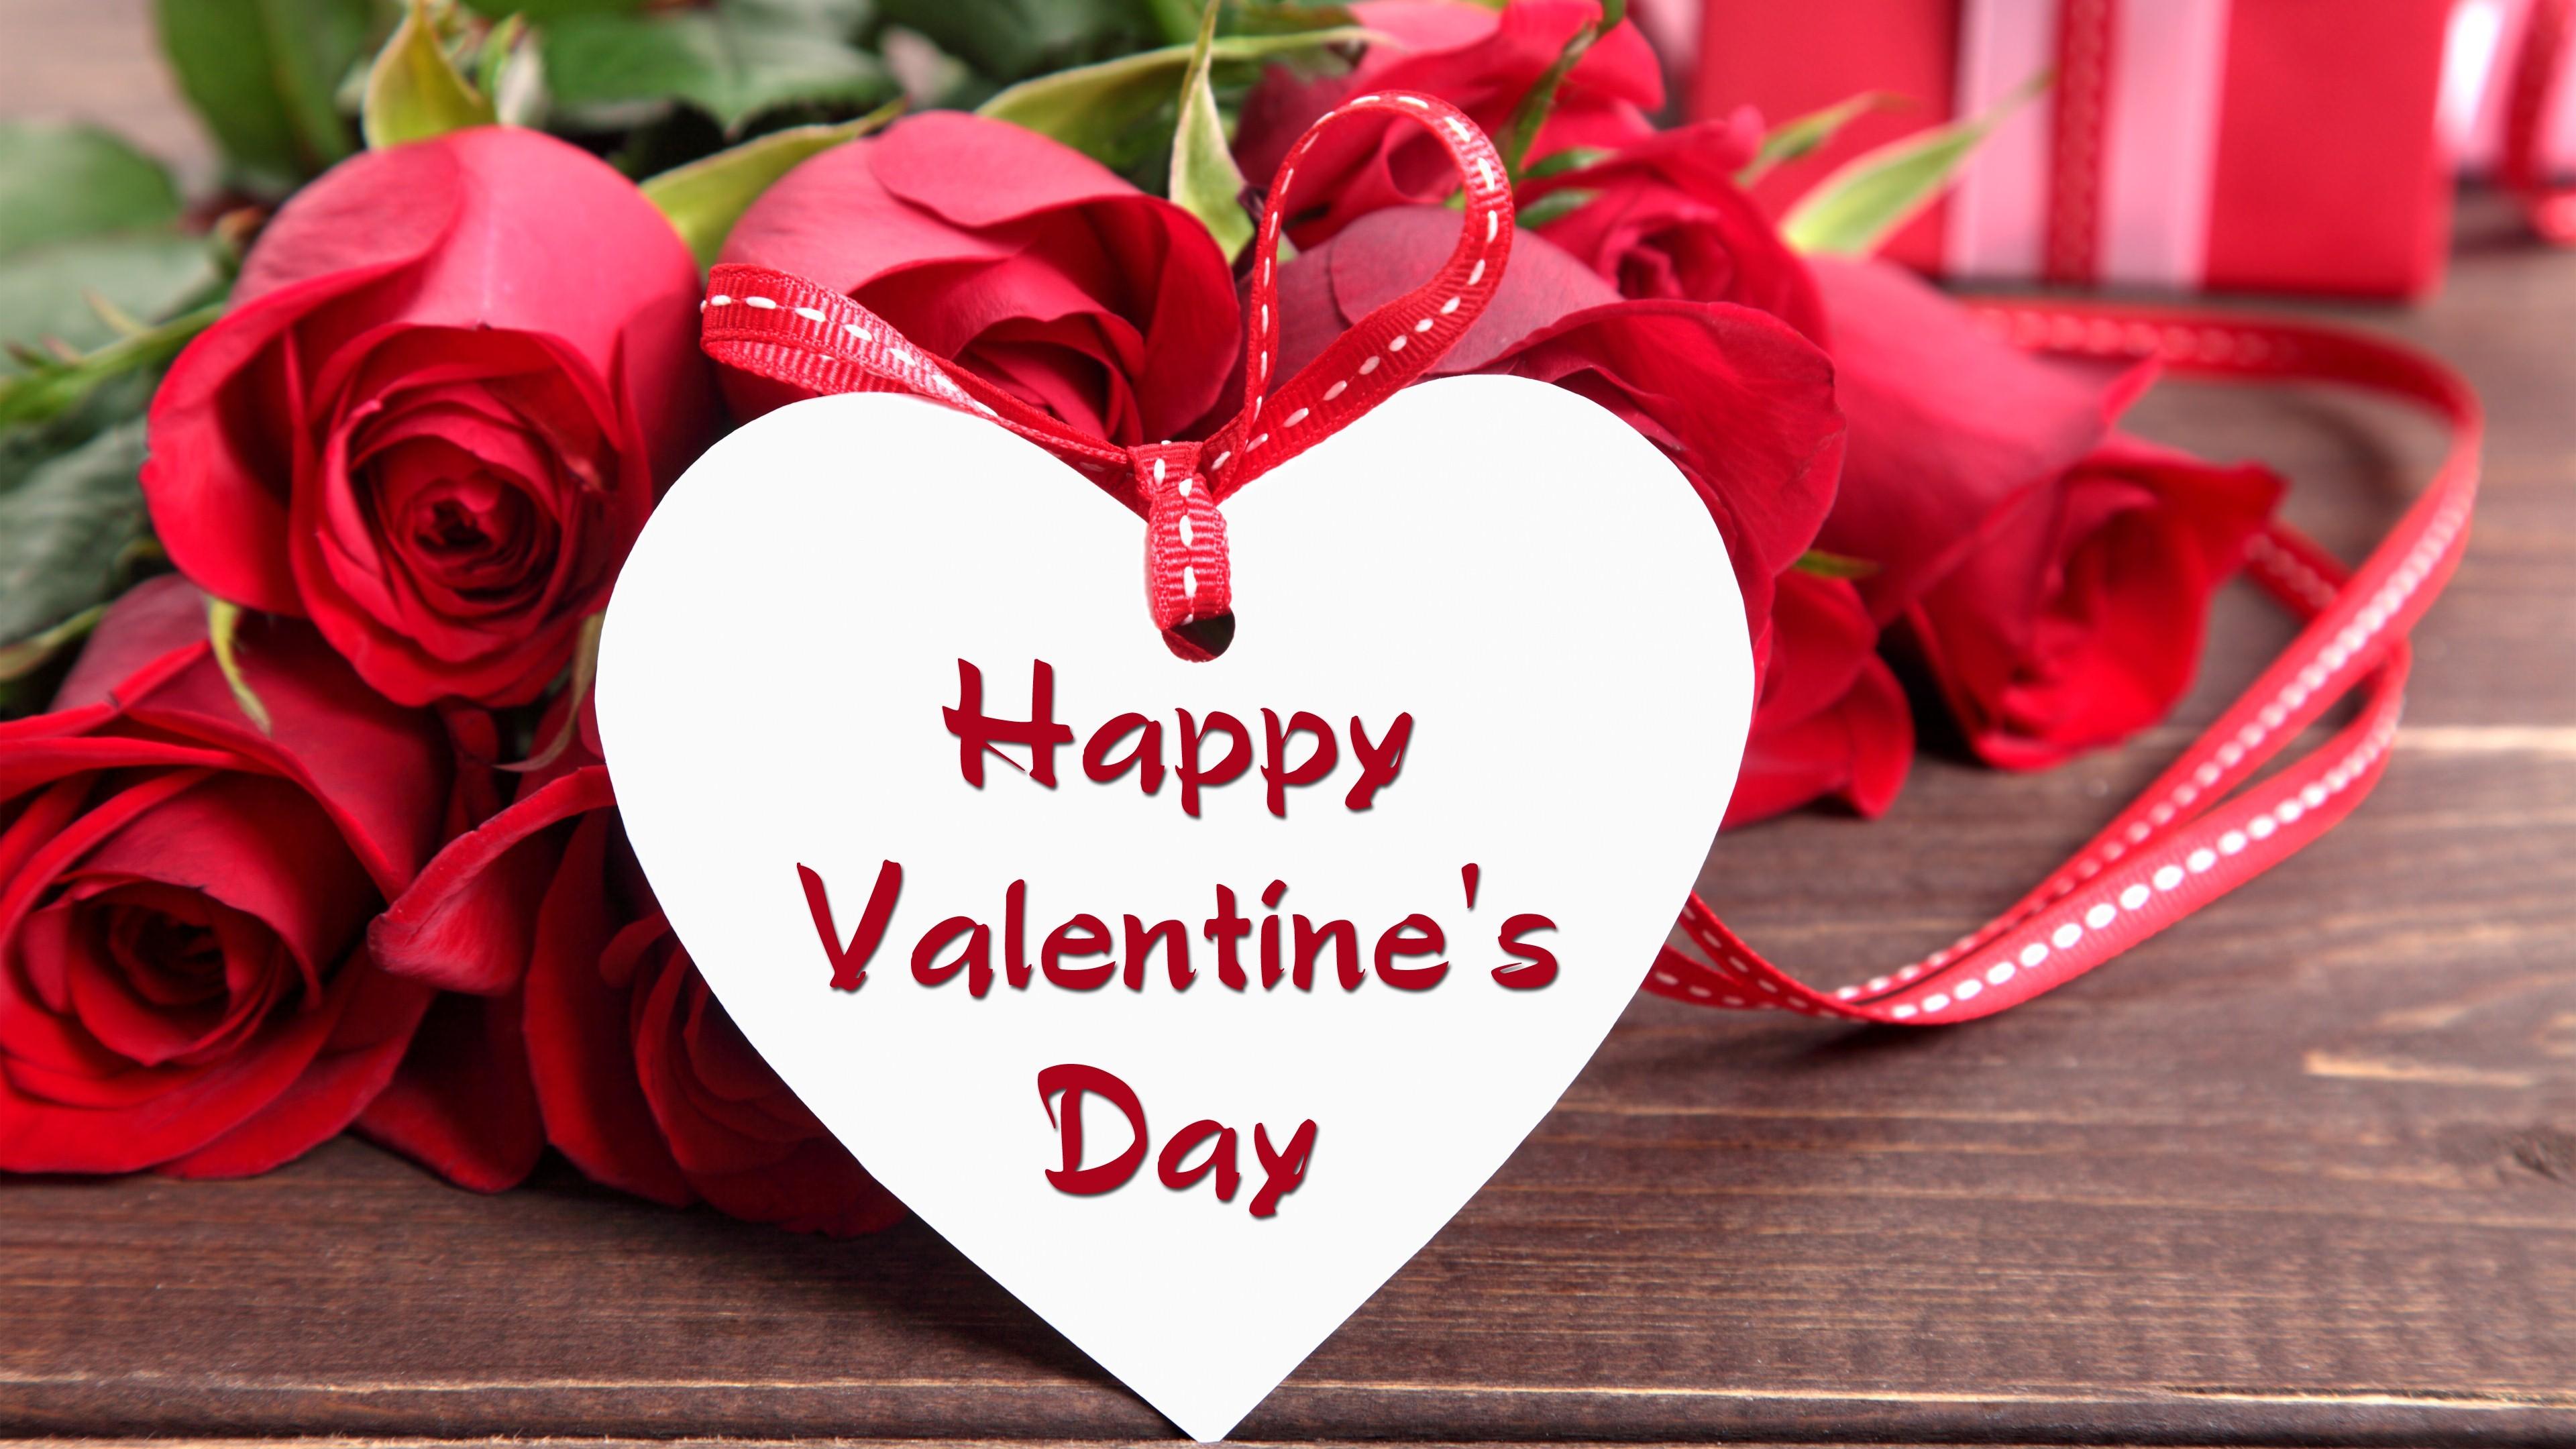 1920x1080 Cute Valentines Day Desktop Wallpaper